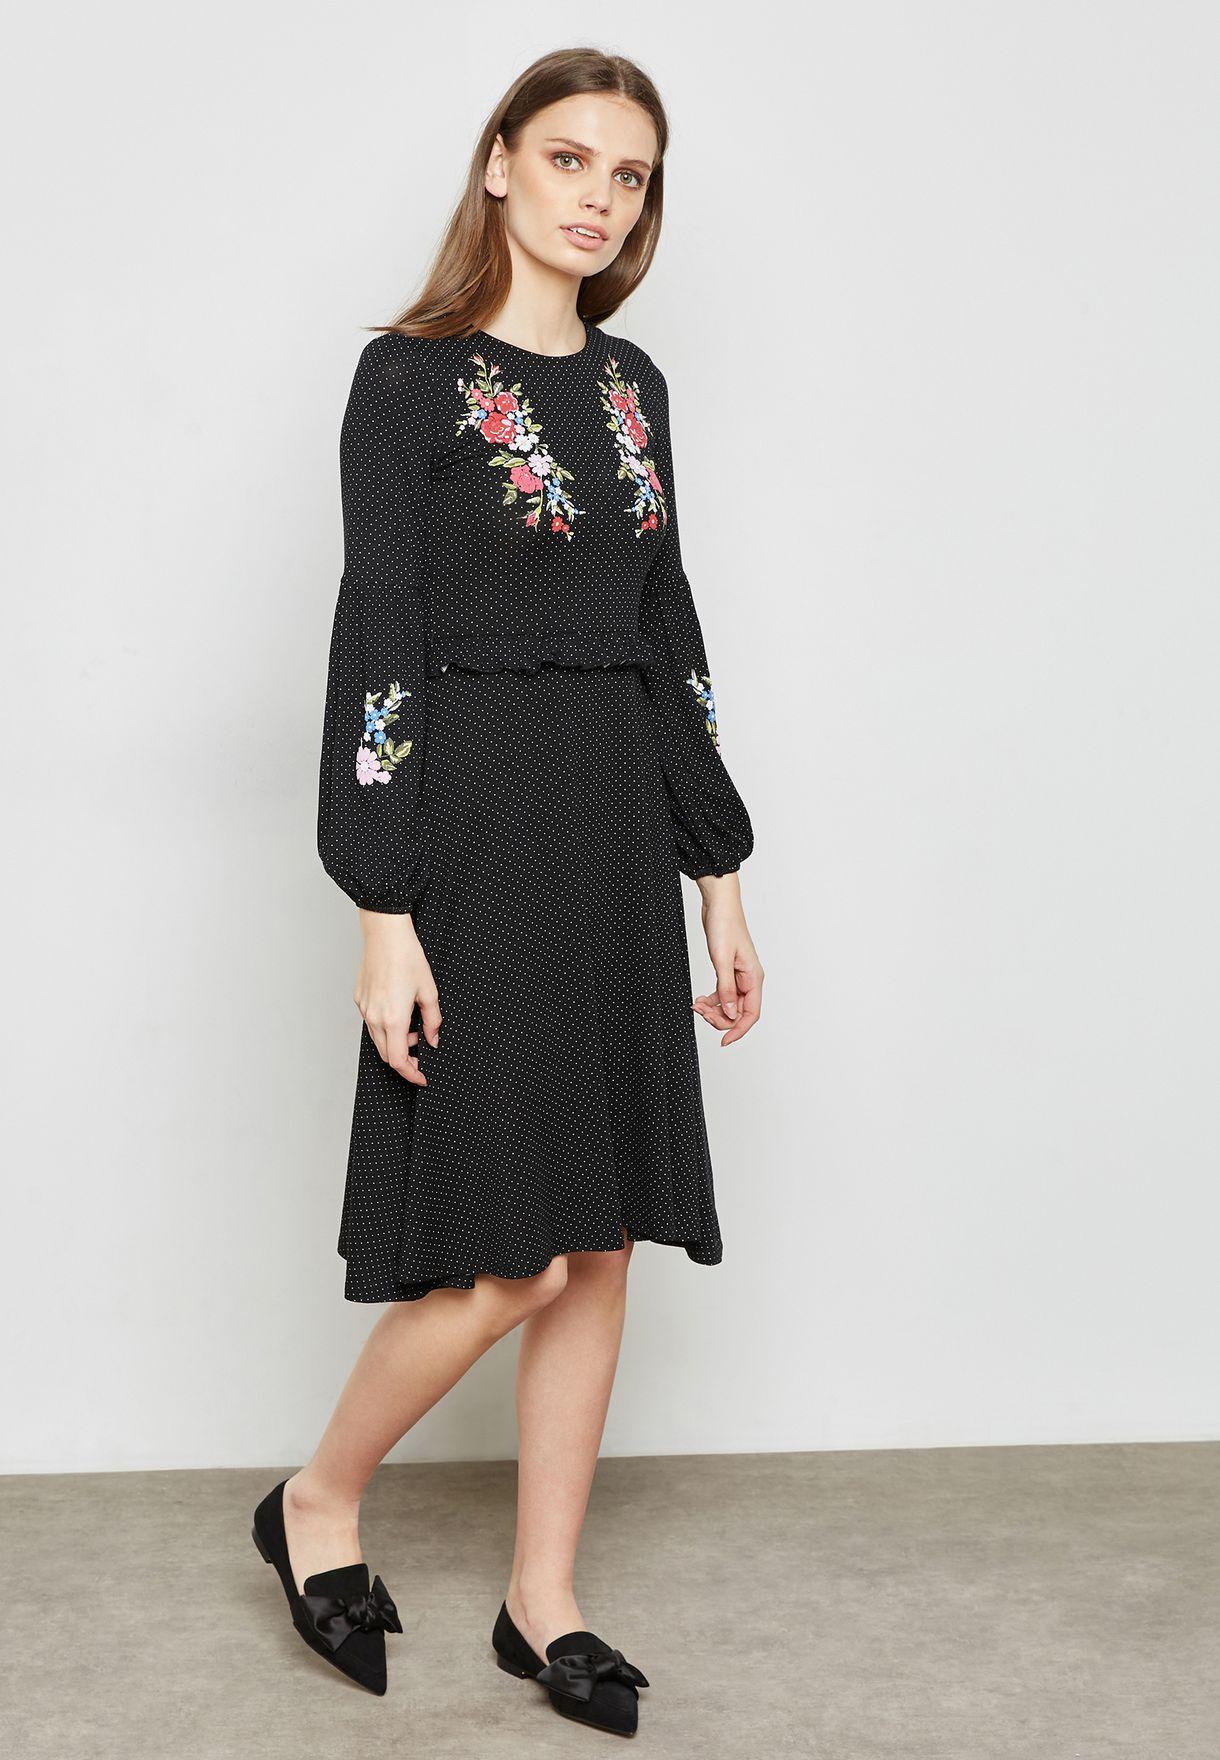 Embroidered Spot Dress